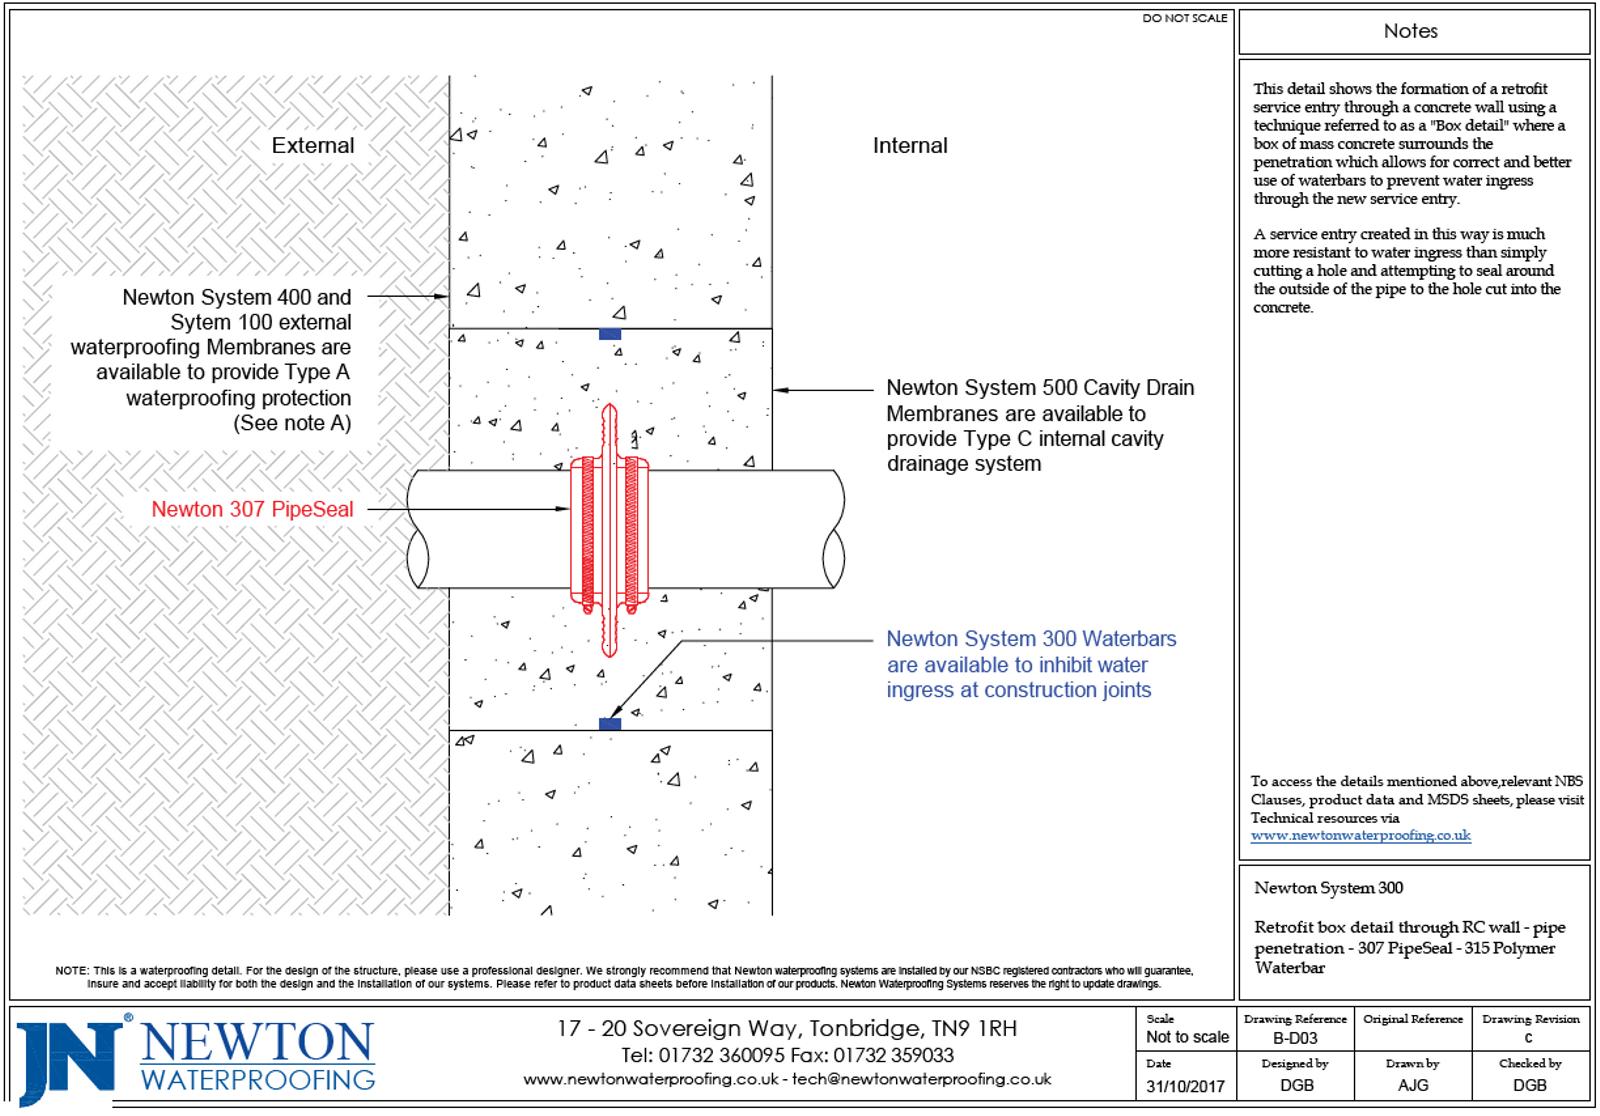 Technical Drawing - Retrofit box detail through RC wall